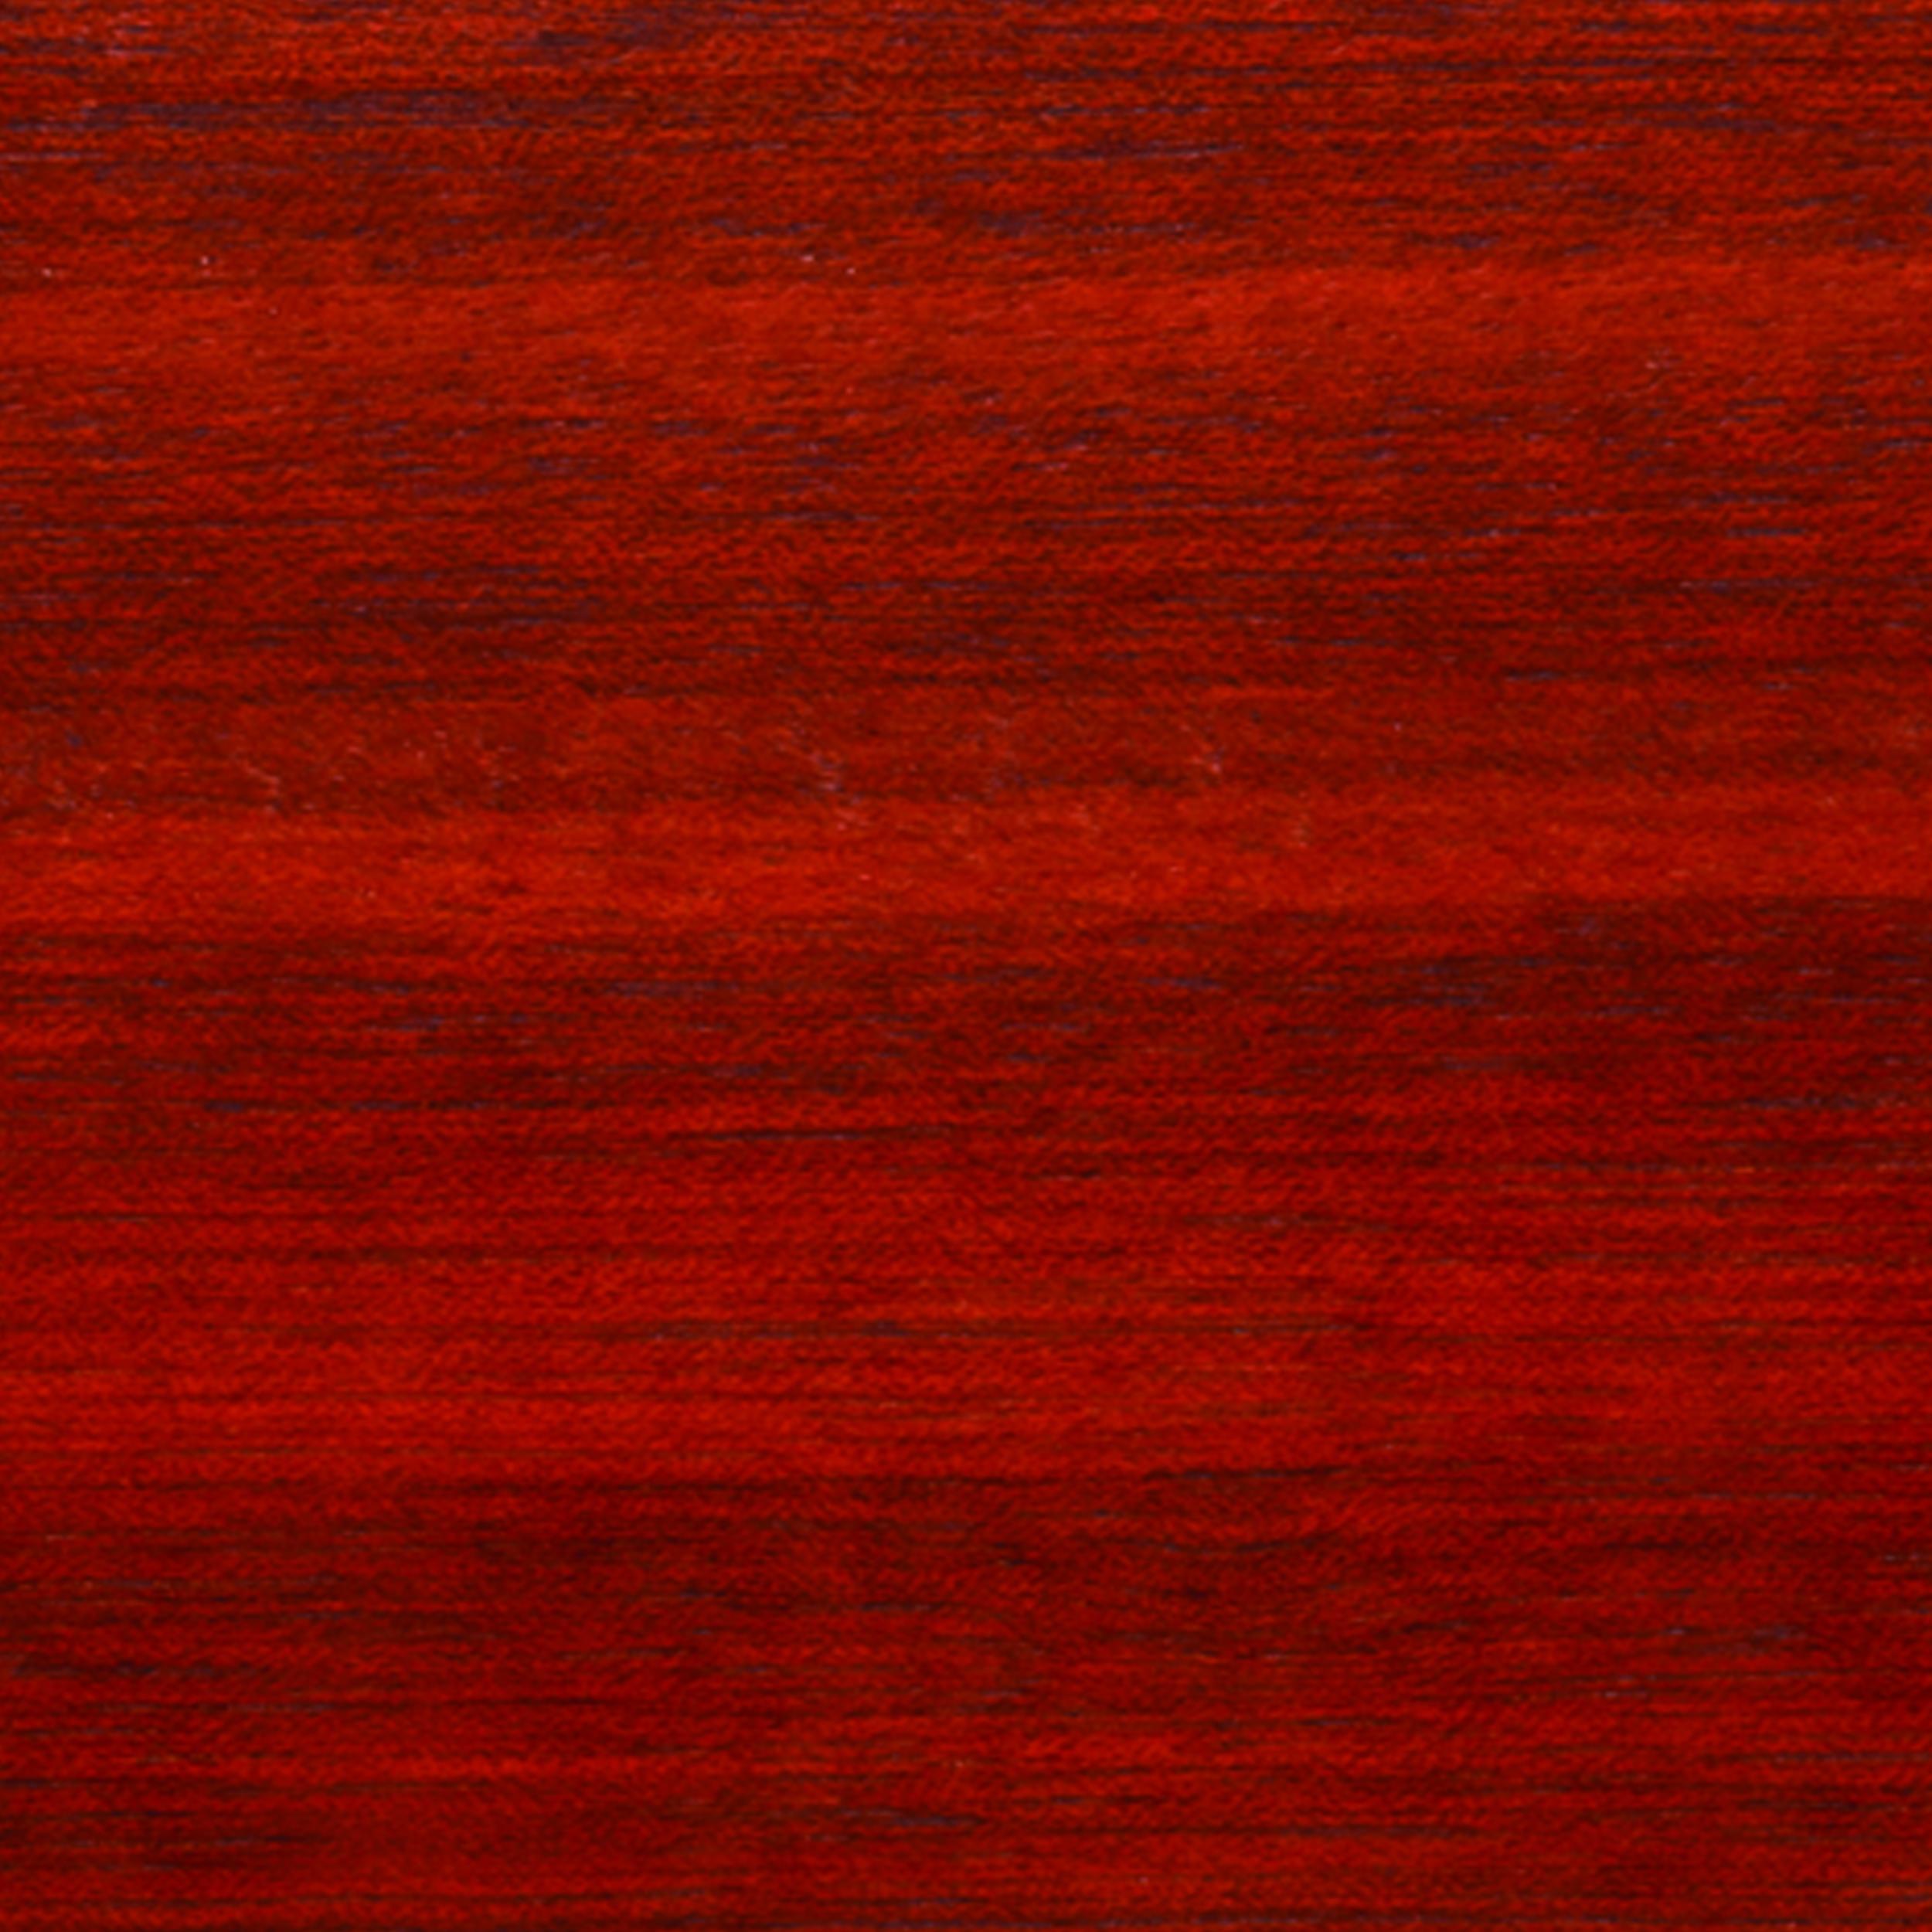 Bloodwood 1/8